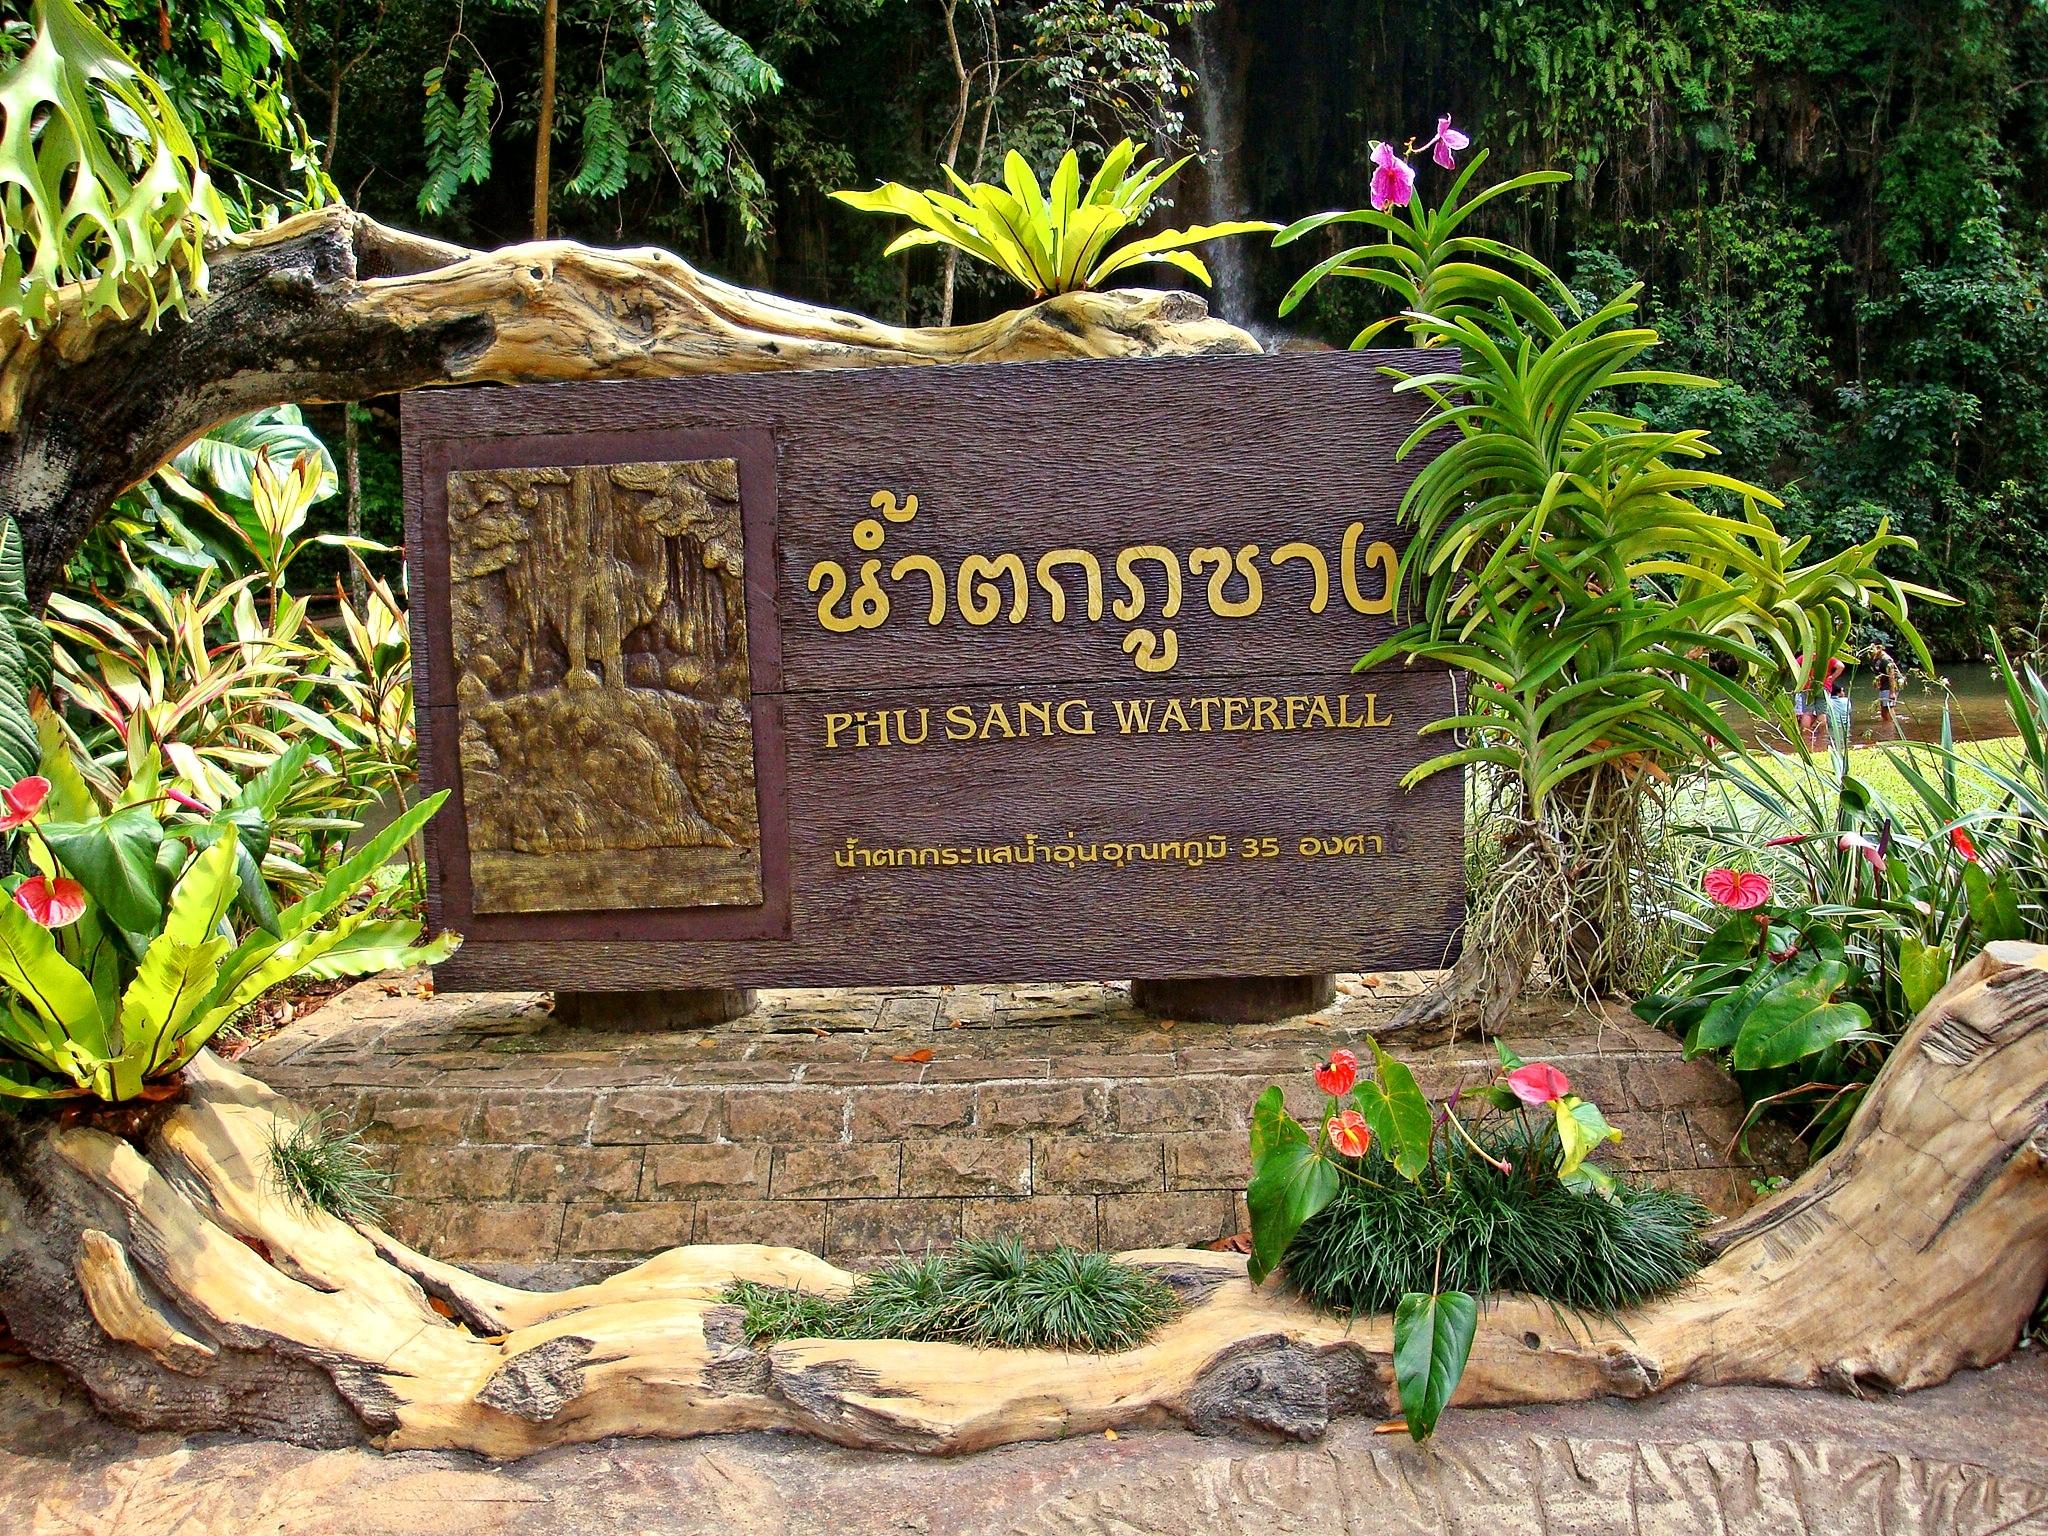 Free Images : jungle, backyard, botany, garden, thailand, yard ...